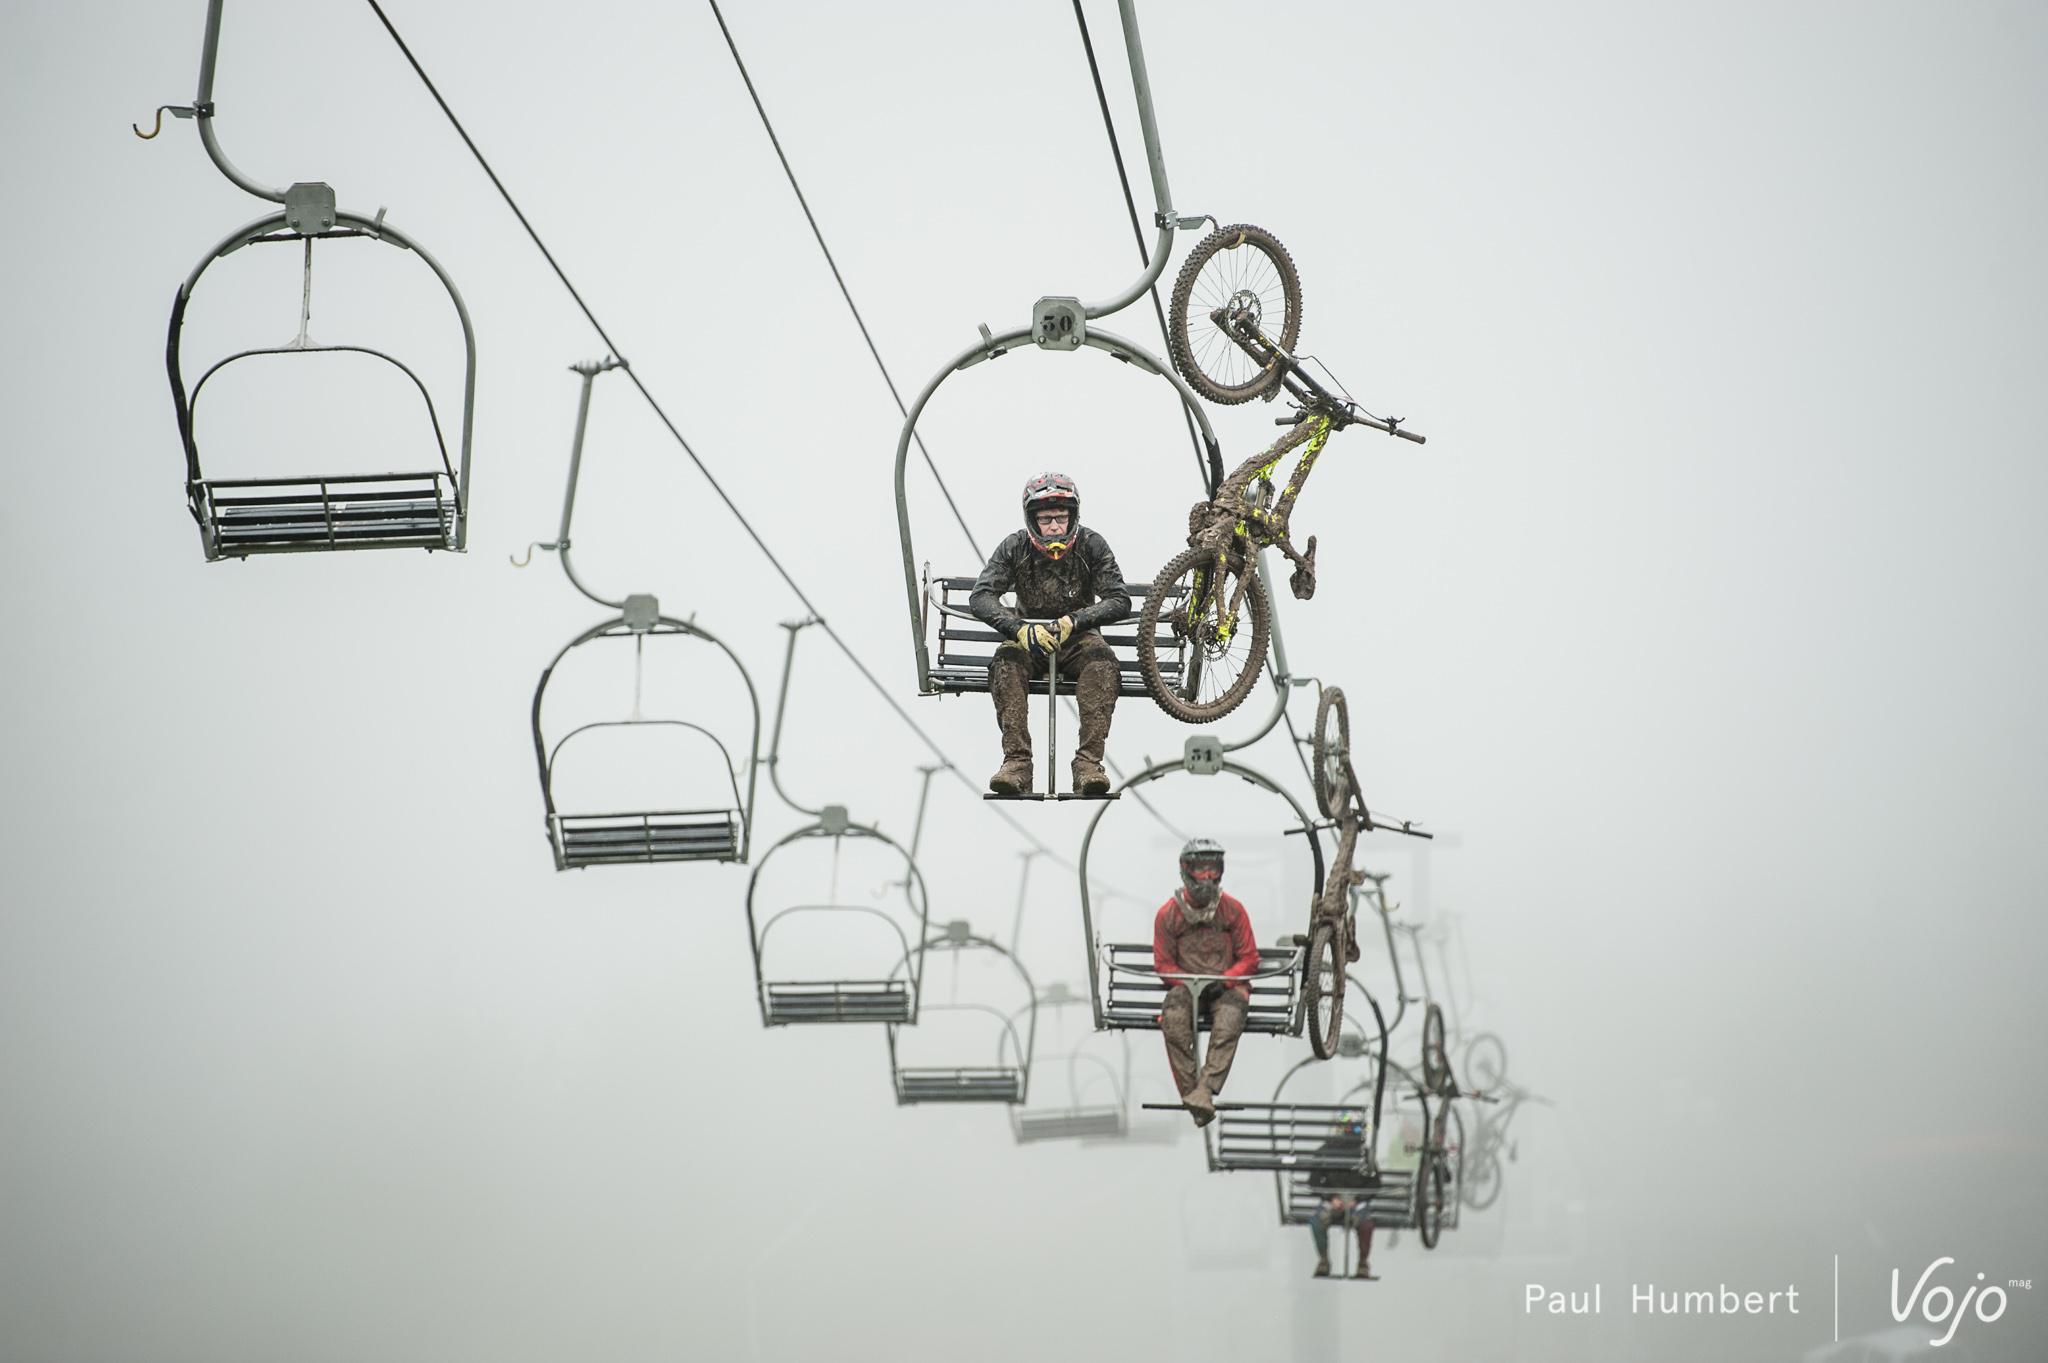 Crankworx-dimanche-vojo-2016-paul-humbert-6